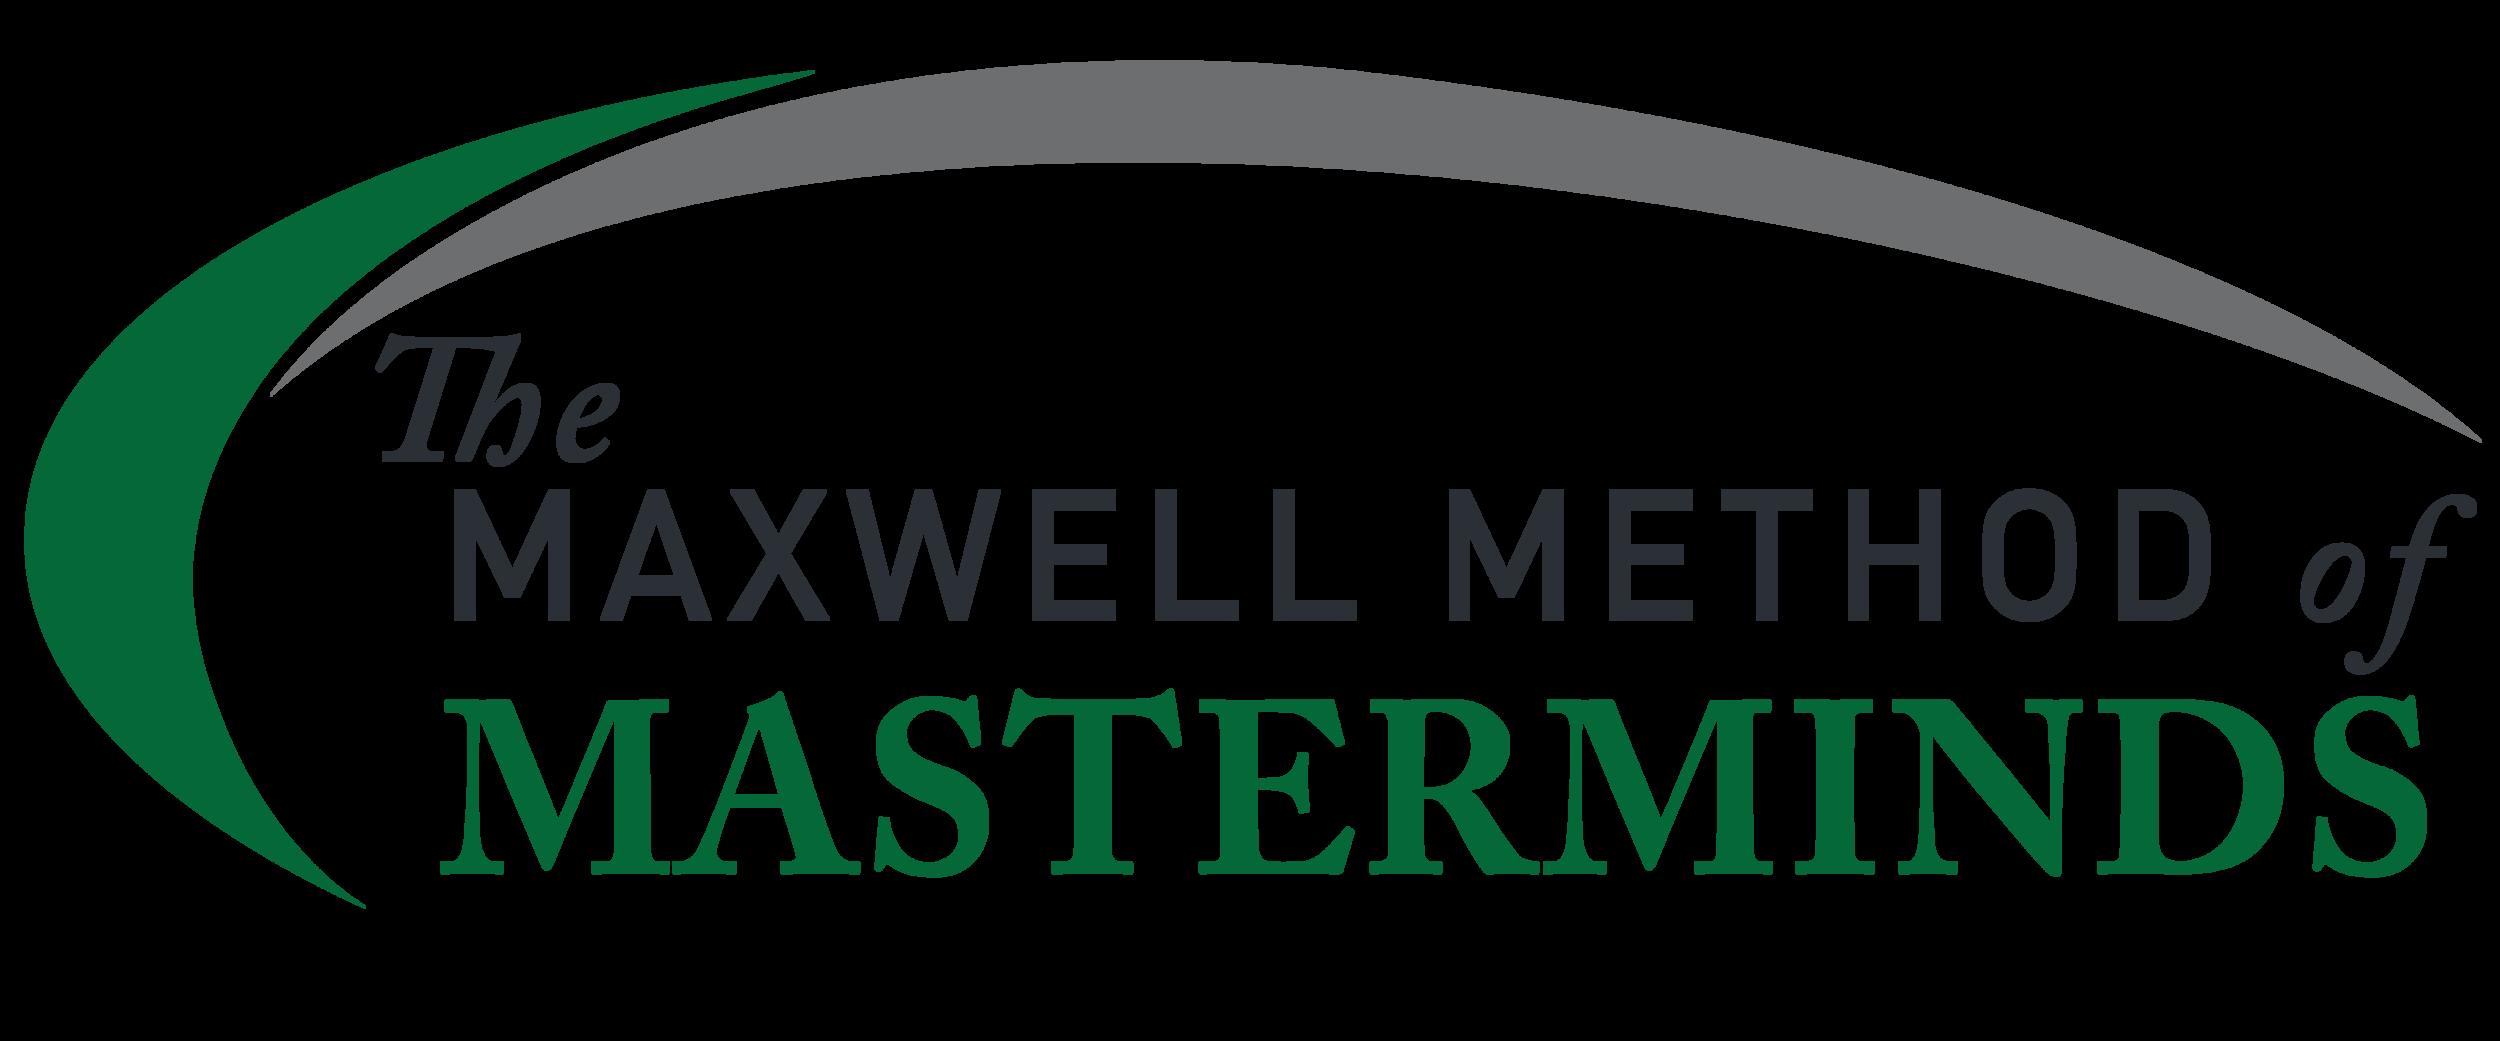 Maxwell-Method-Mastermind.png